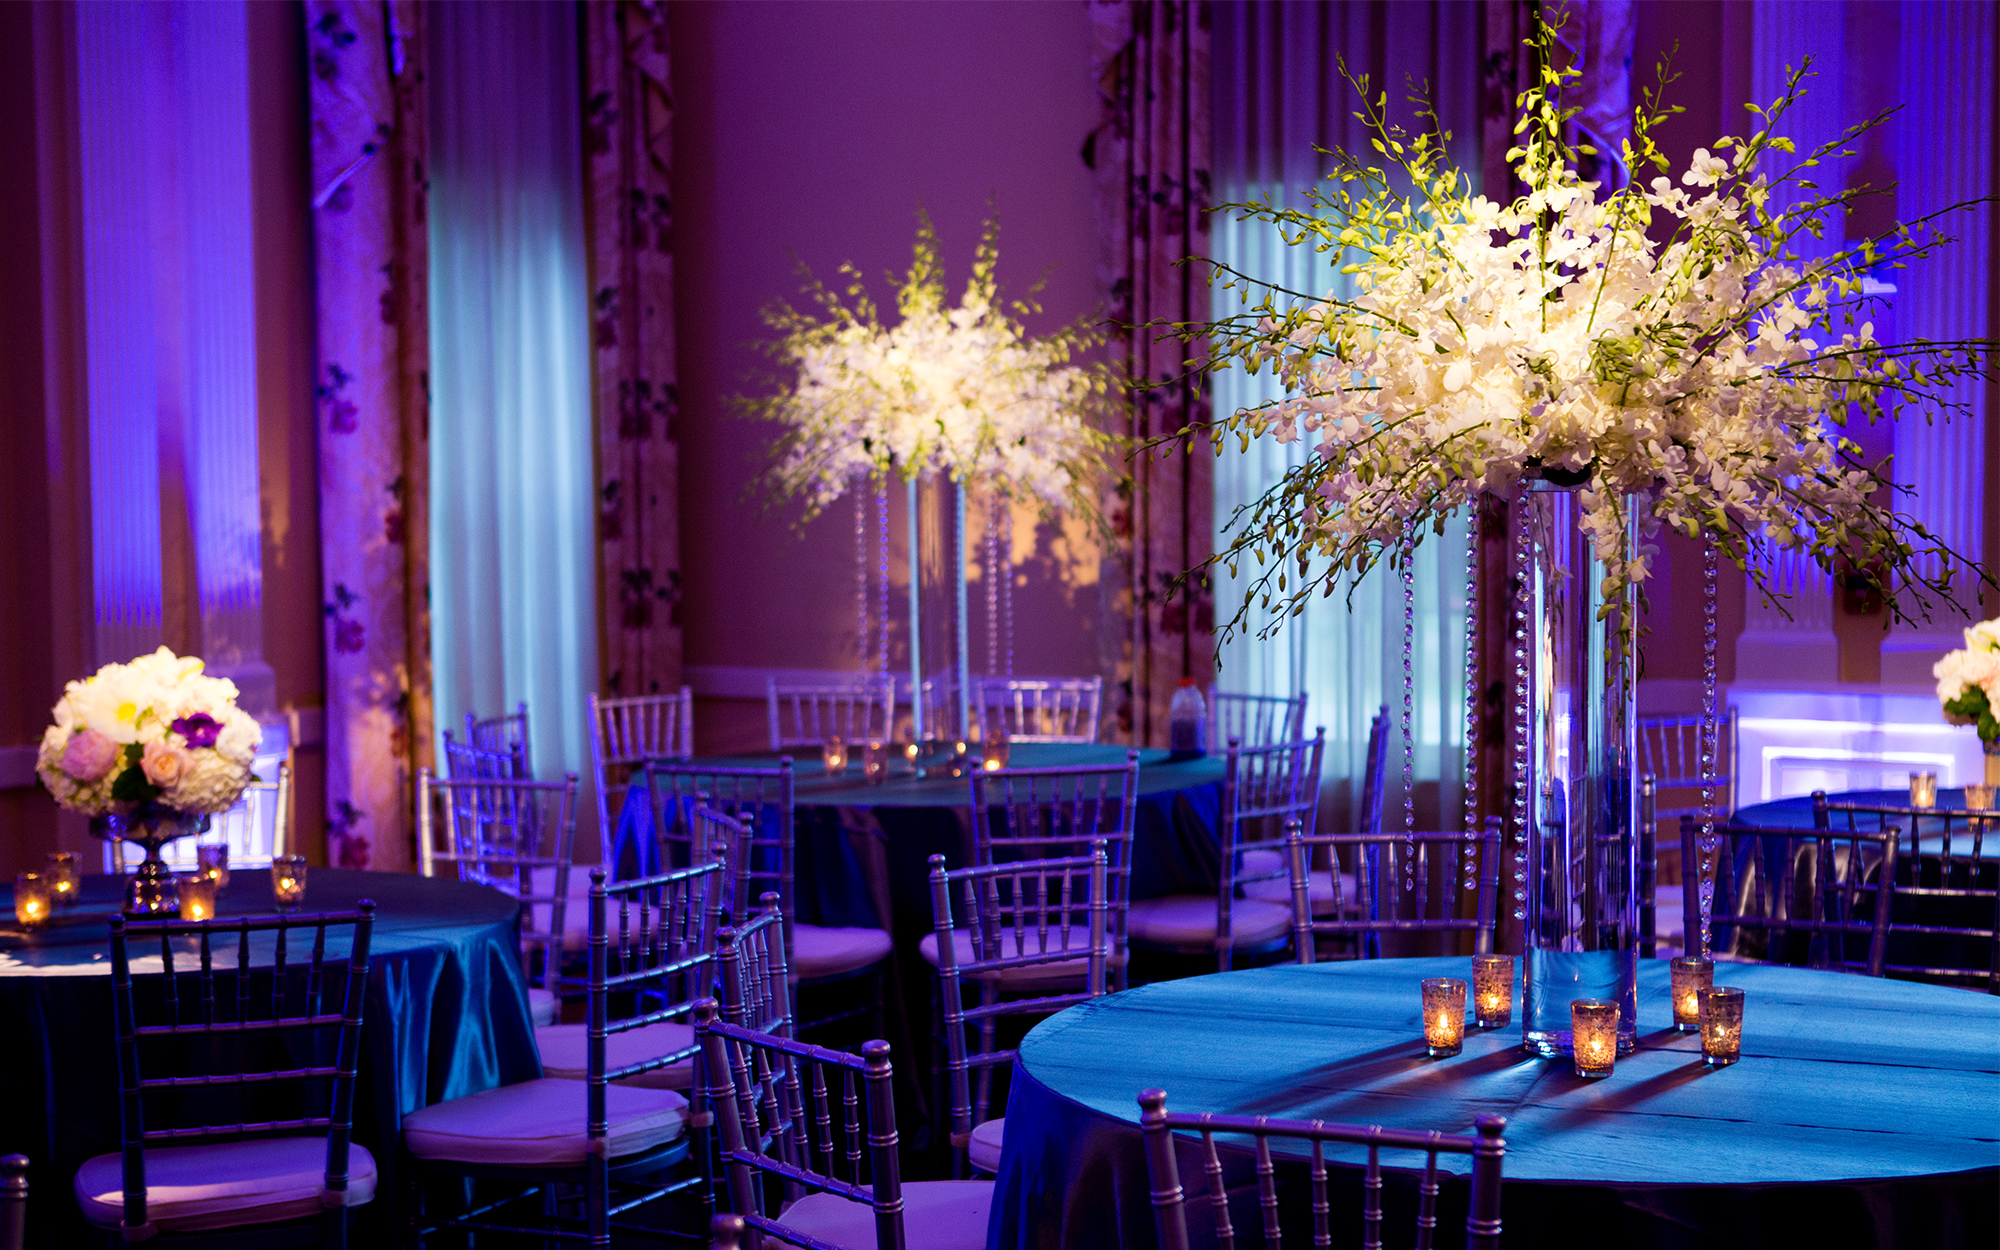 Pinspotting and Uplighting at Arlington Hall